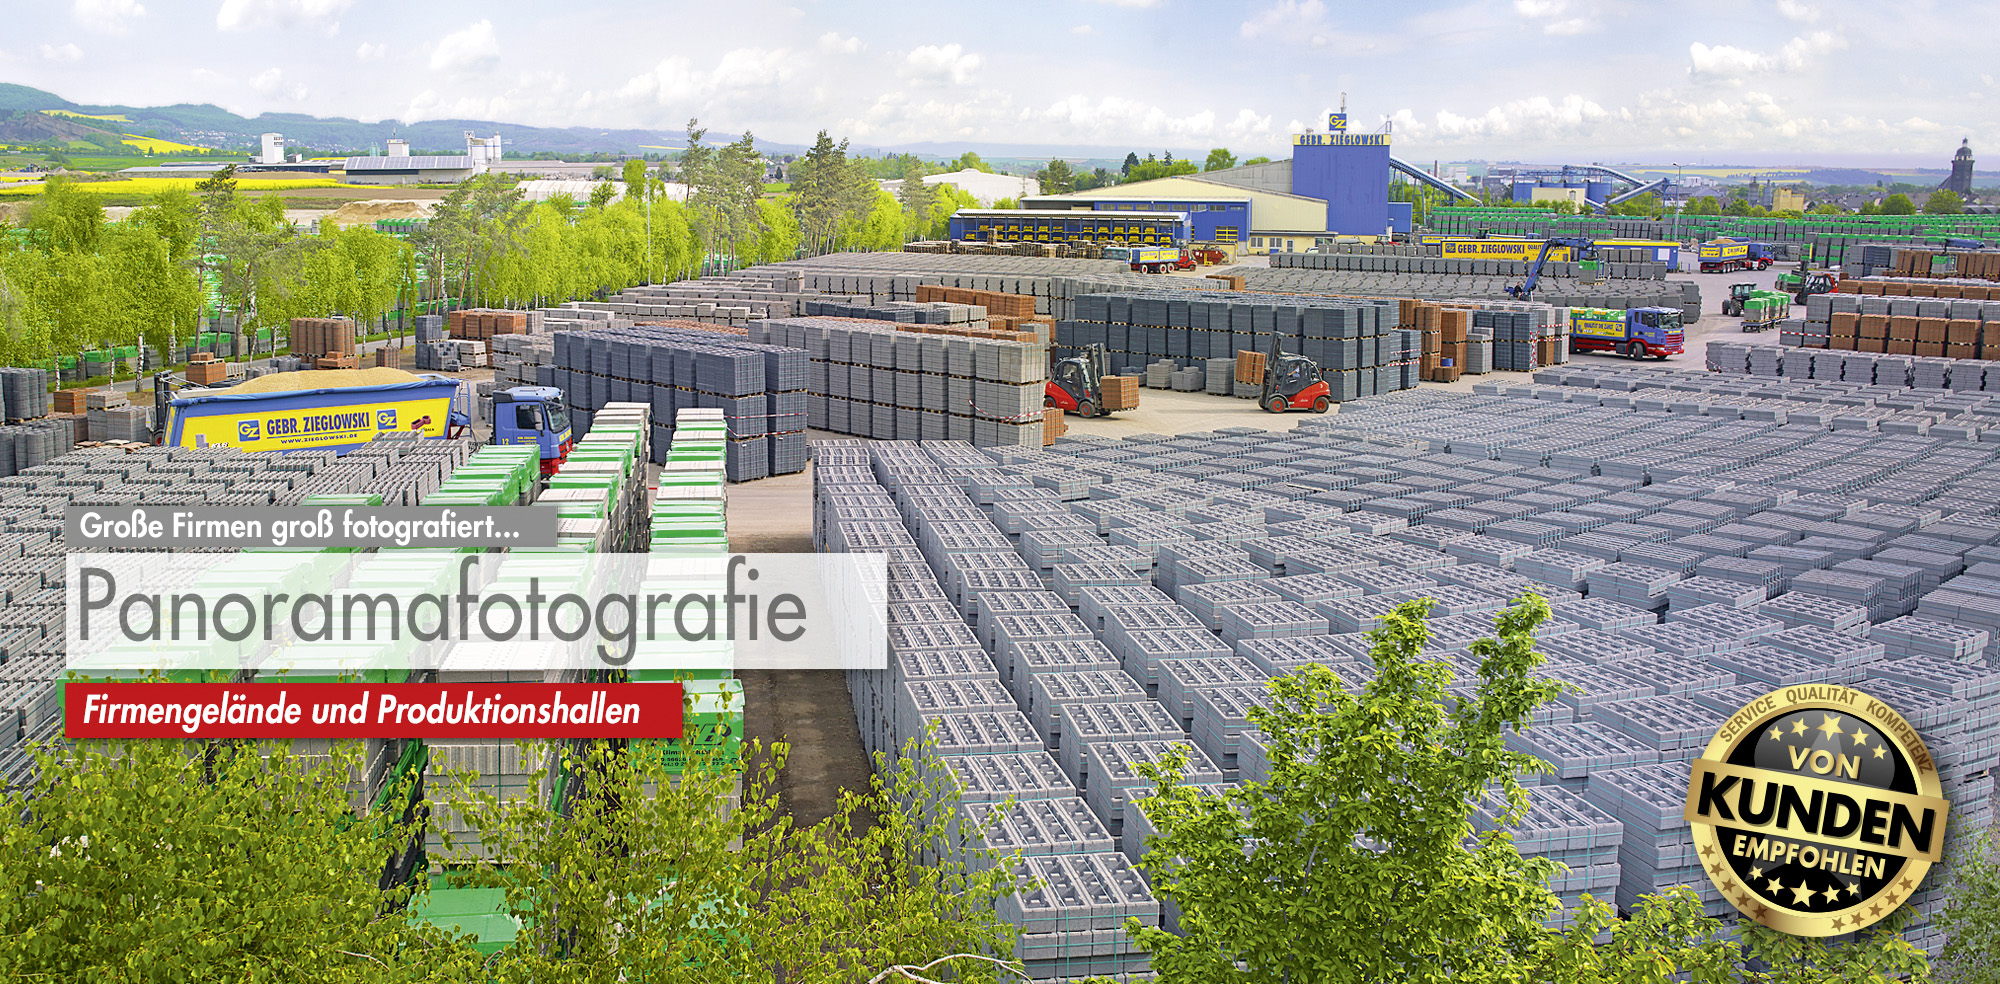 Imagefilme, Industriefilme, Schulungsvideos, Werbespots, 3D-Animationvideos @ BlickFang2 Fotostudio, Filmstudio in Weinheim und Andernach, Fotograf